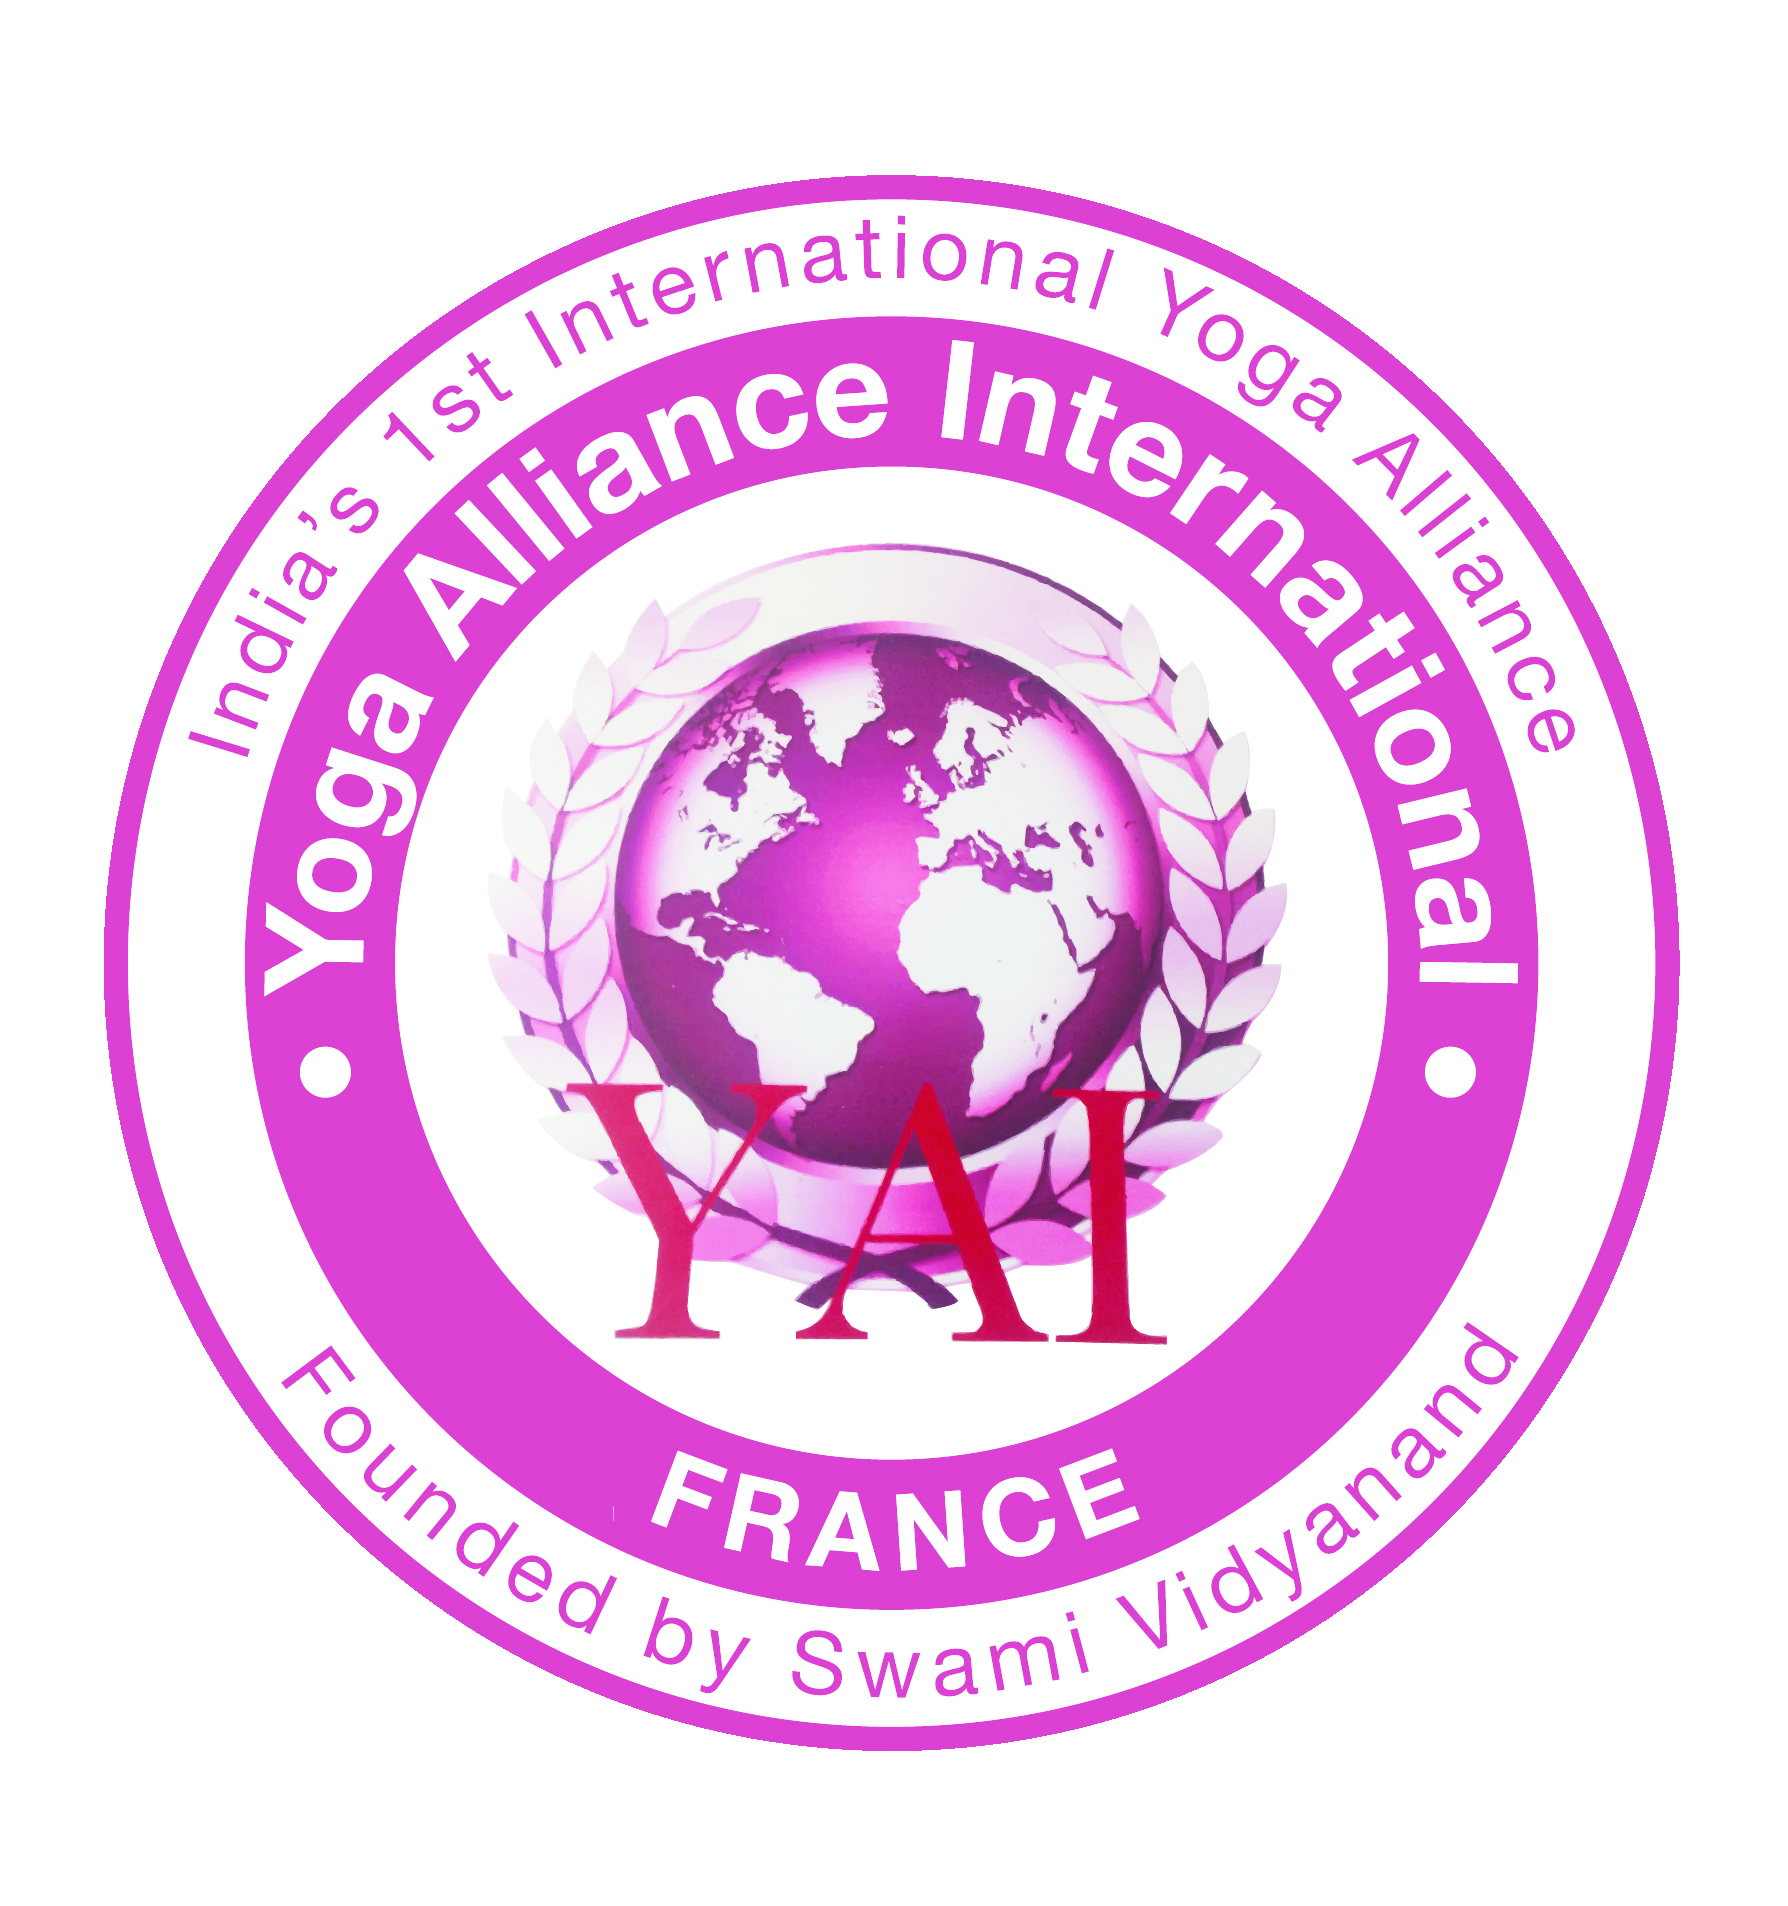 Yoga Alliance International France